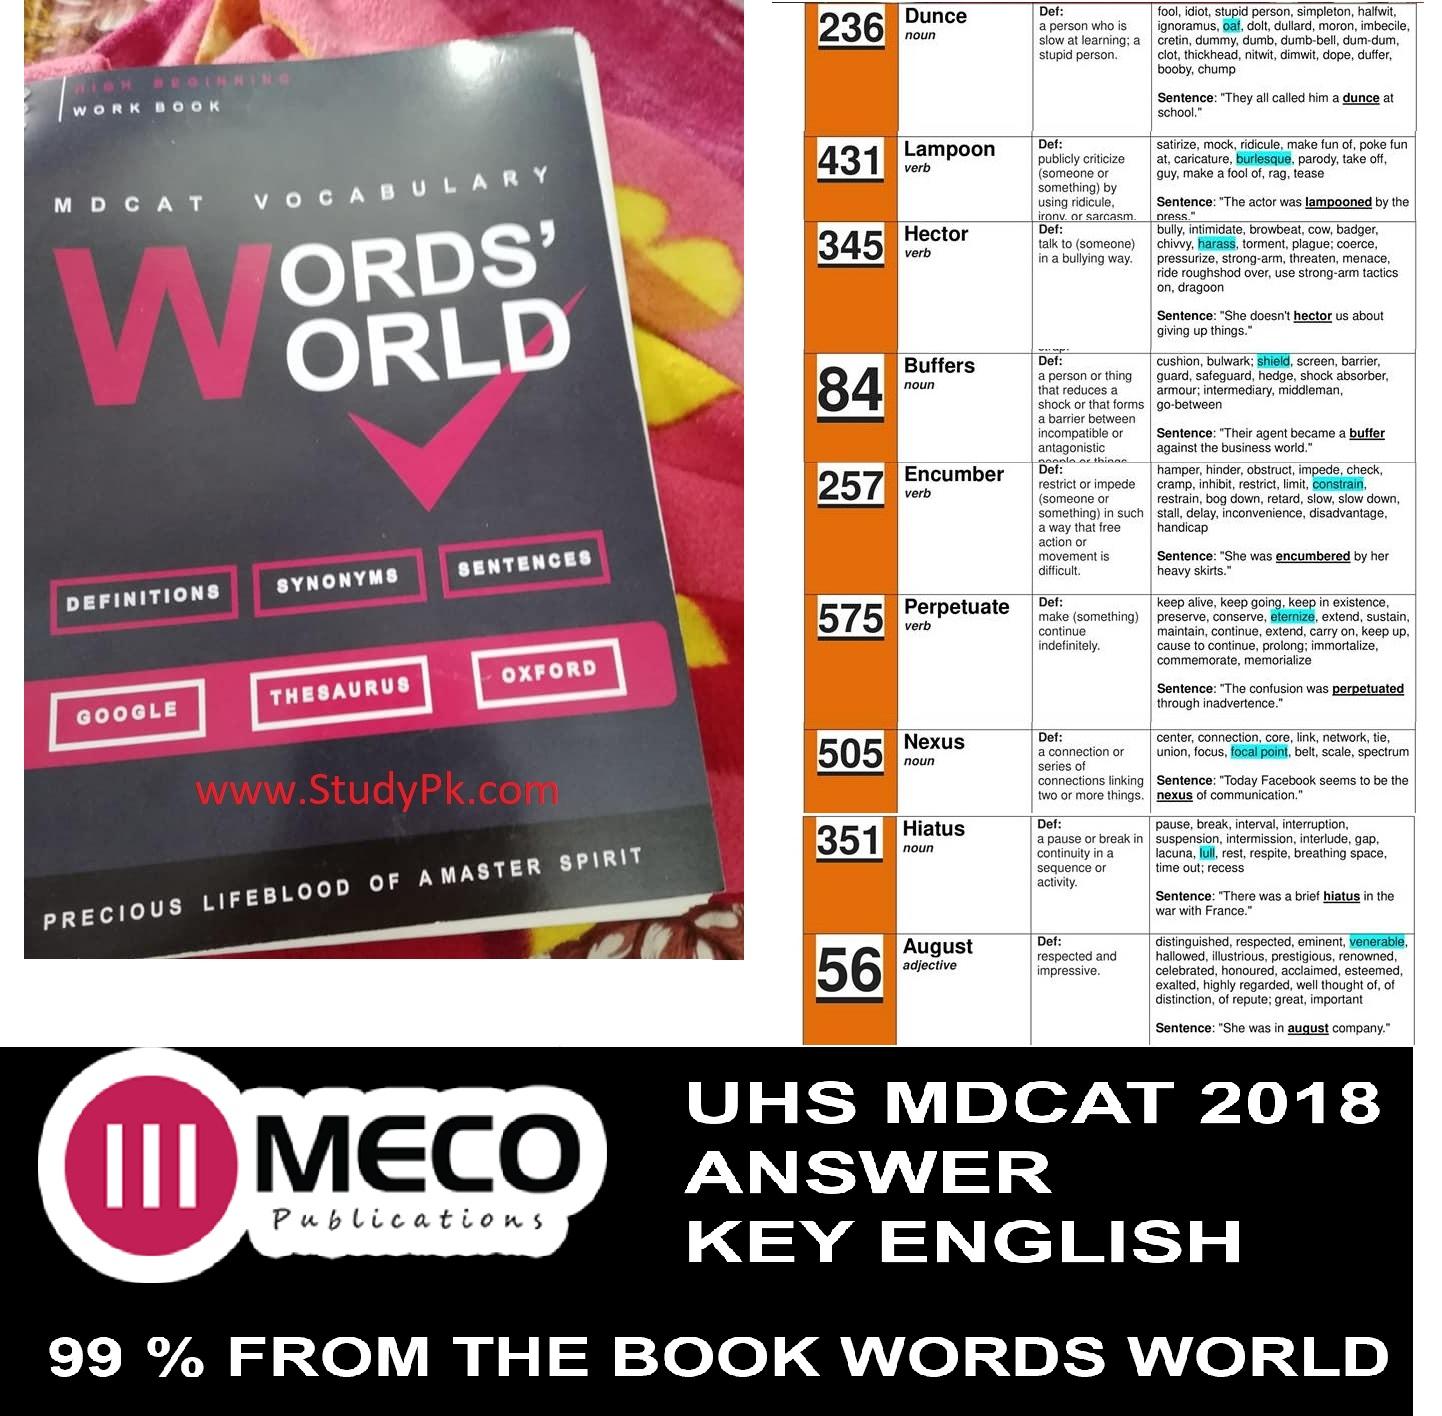 UHS MDCAT Answer Key 2018